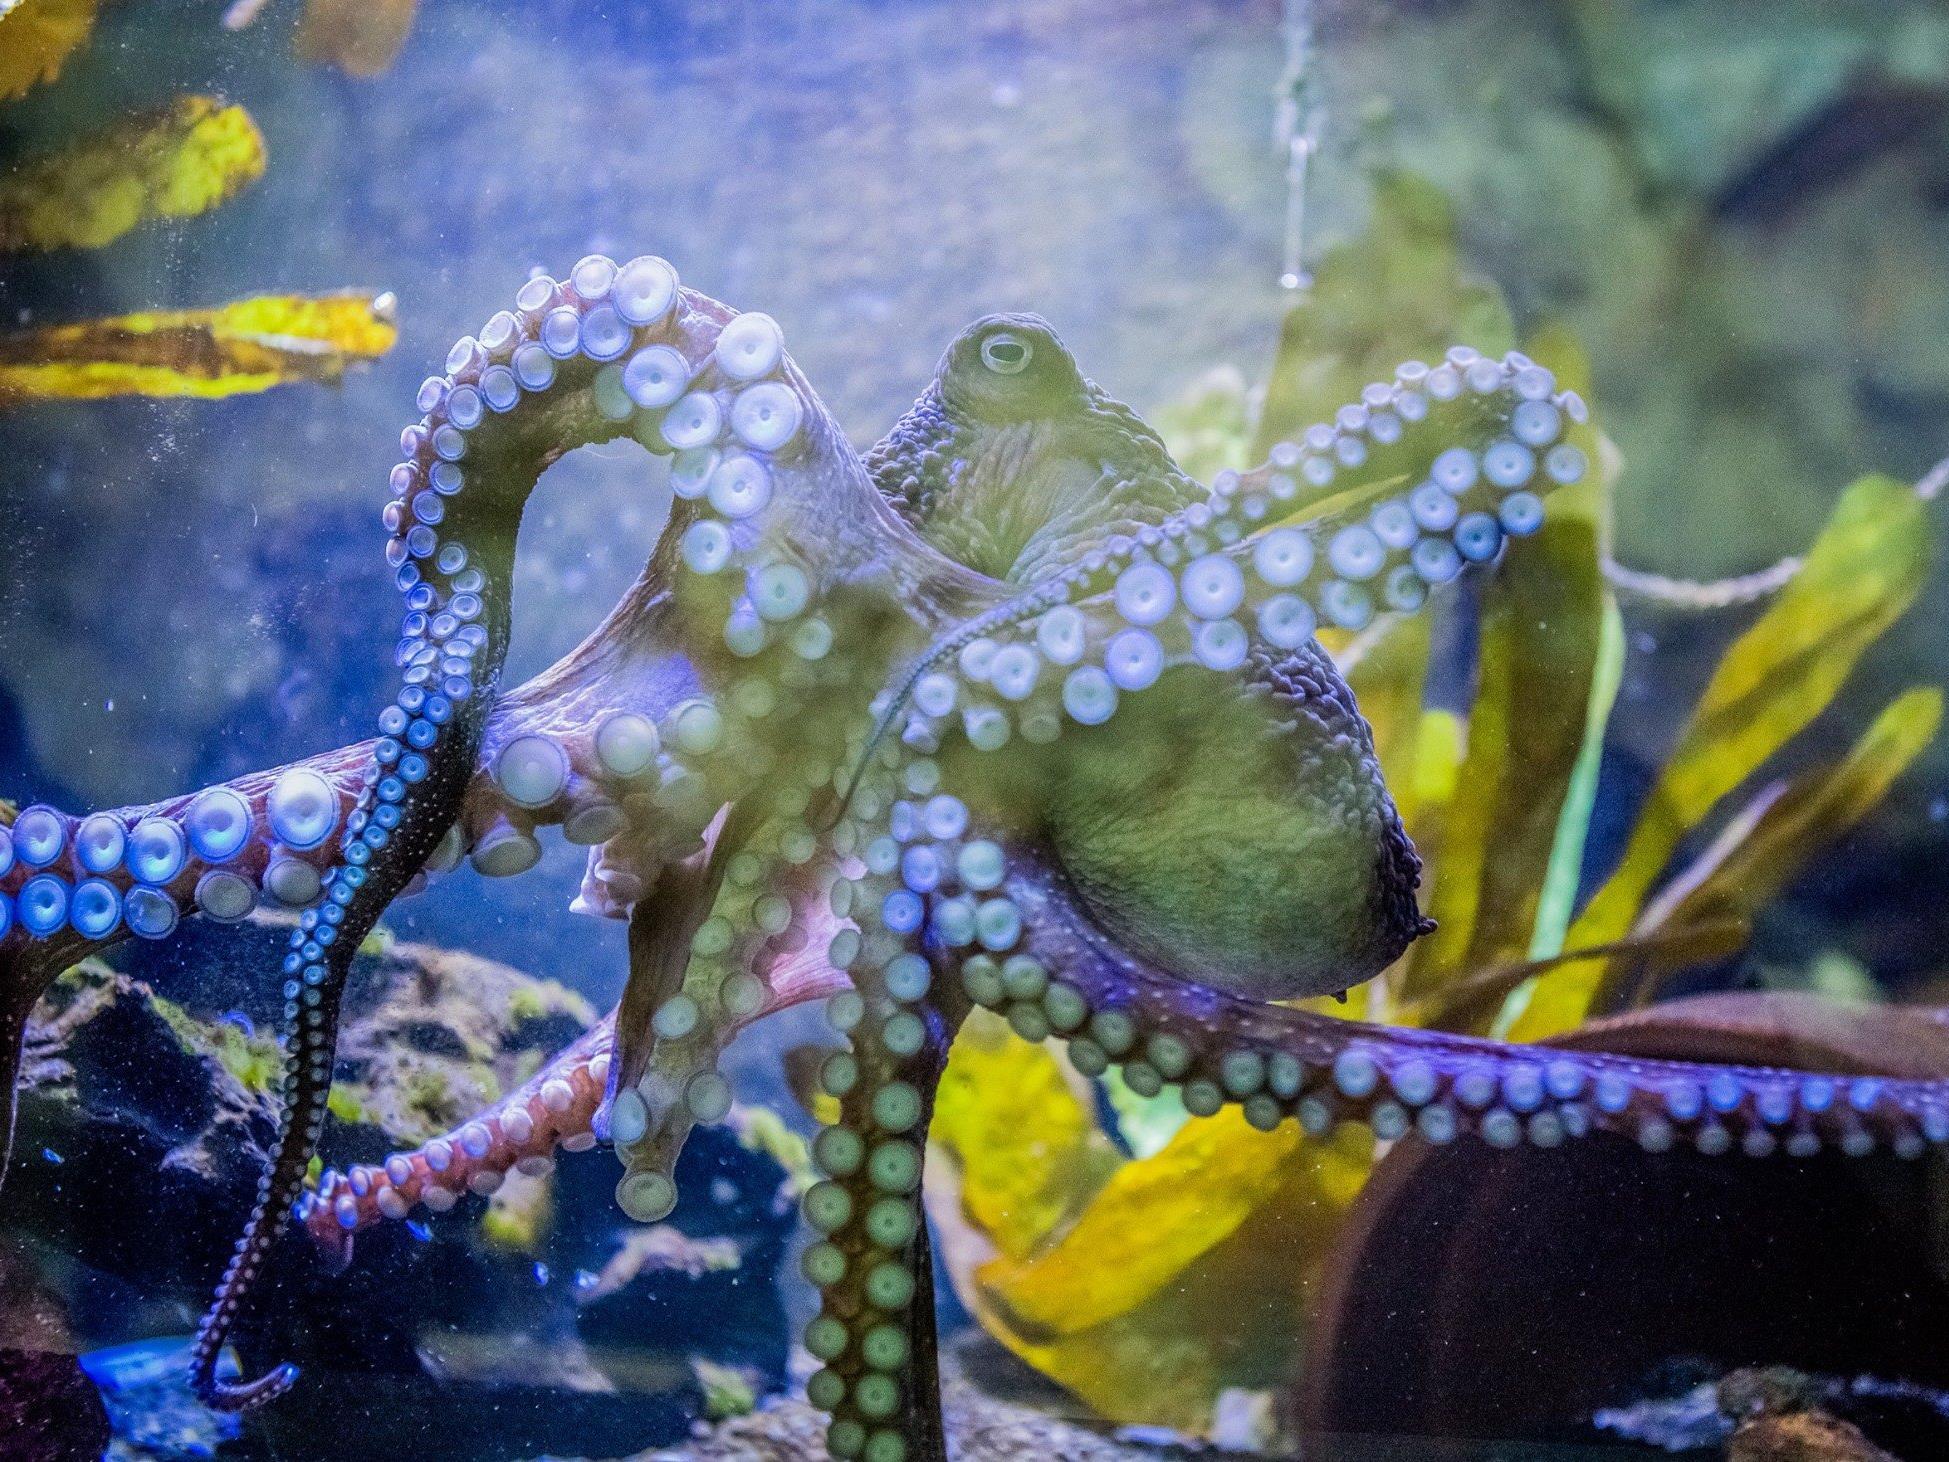 """Houdini"": Oktopus ""Inky"" floh aus Aquarium ins offene Meer"